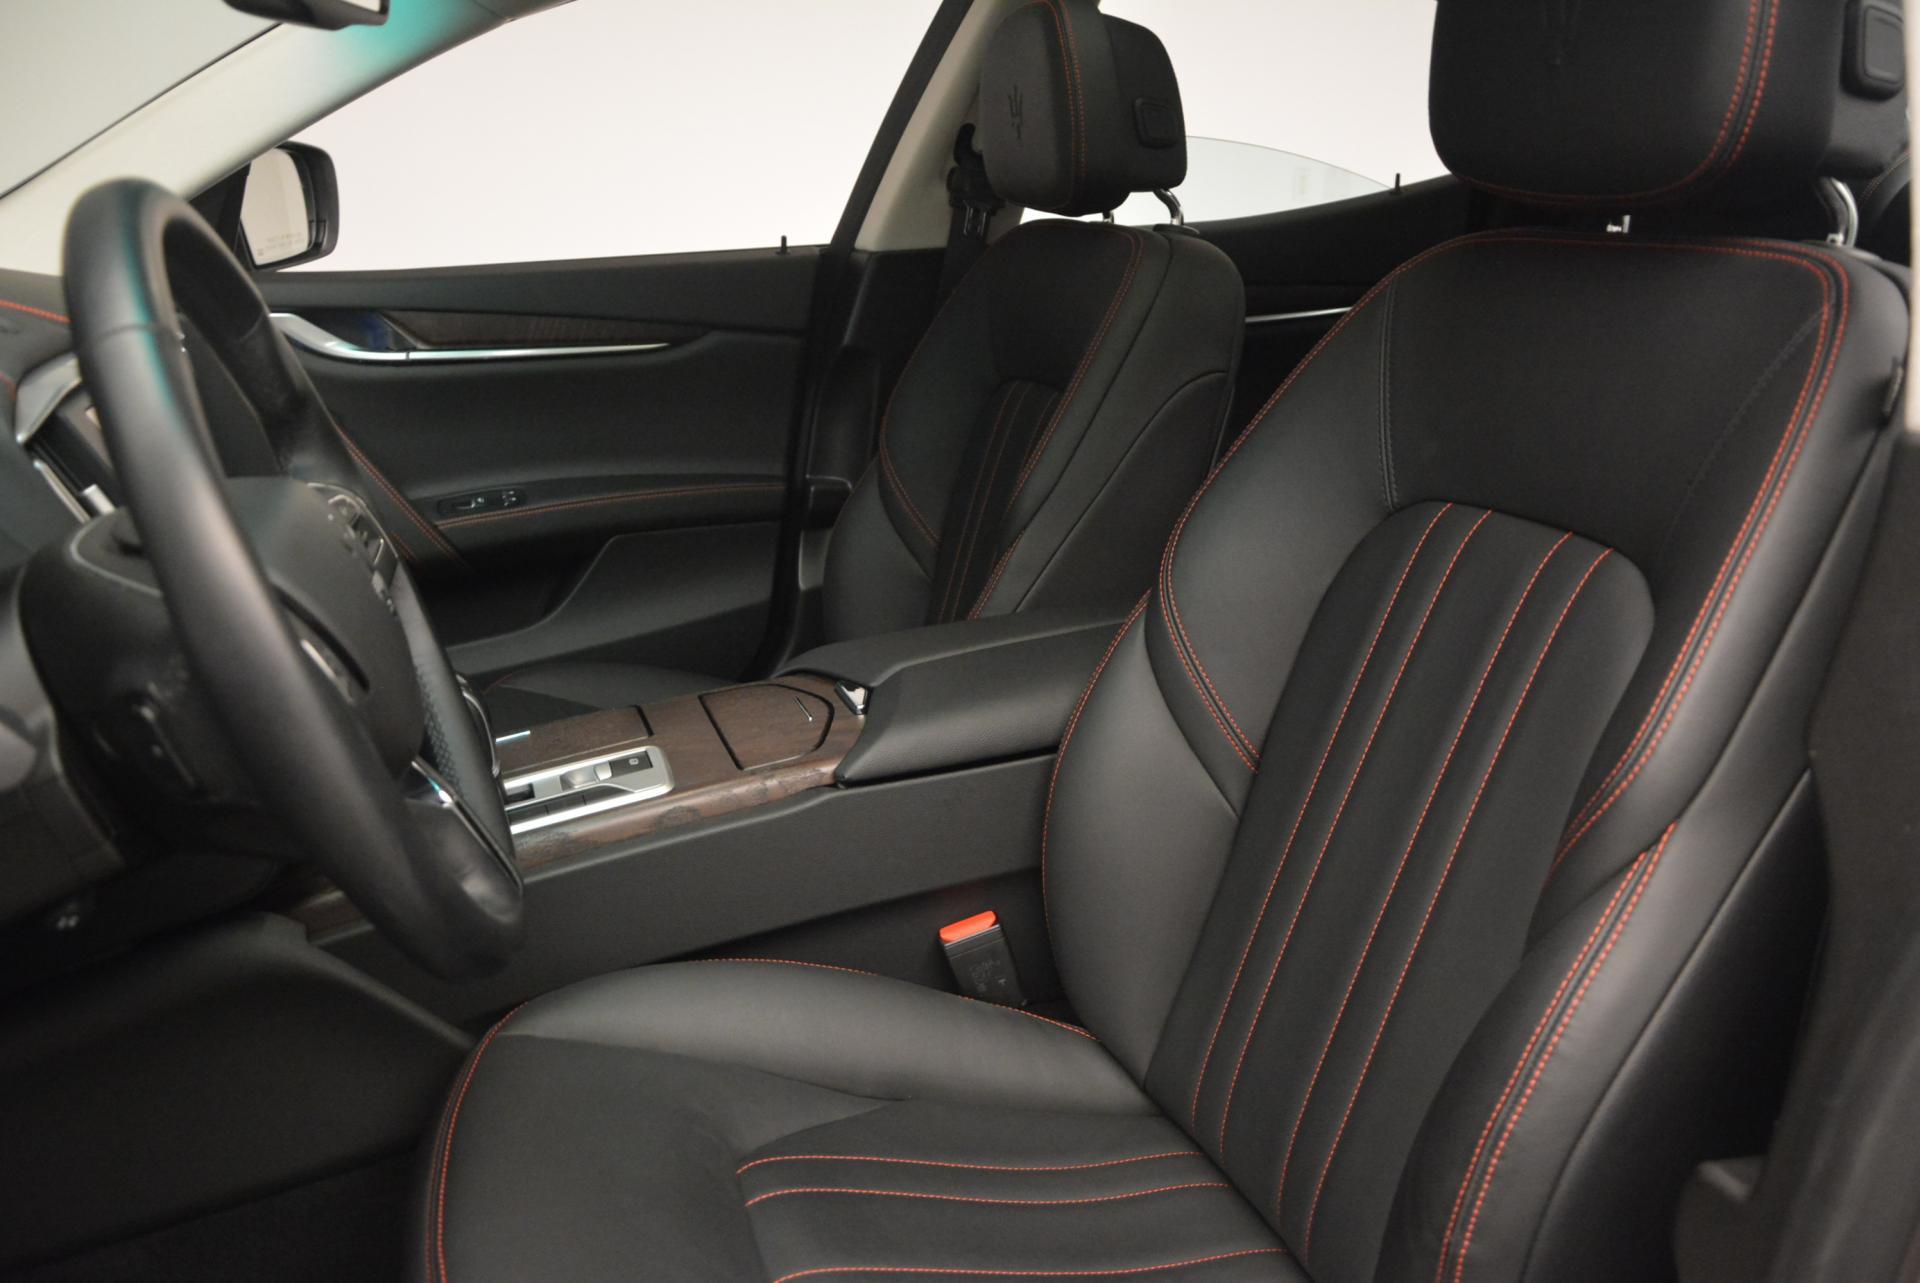 Used 2016 Maserati Ghibli S Q4 For Sale In Westport, CT 192_p24